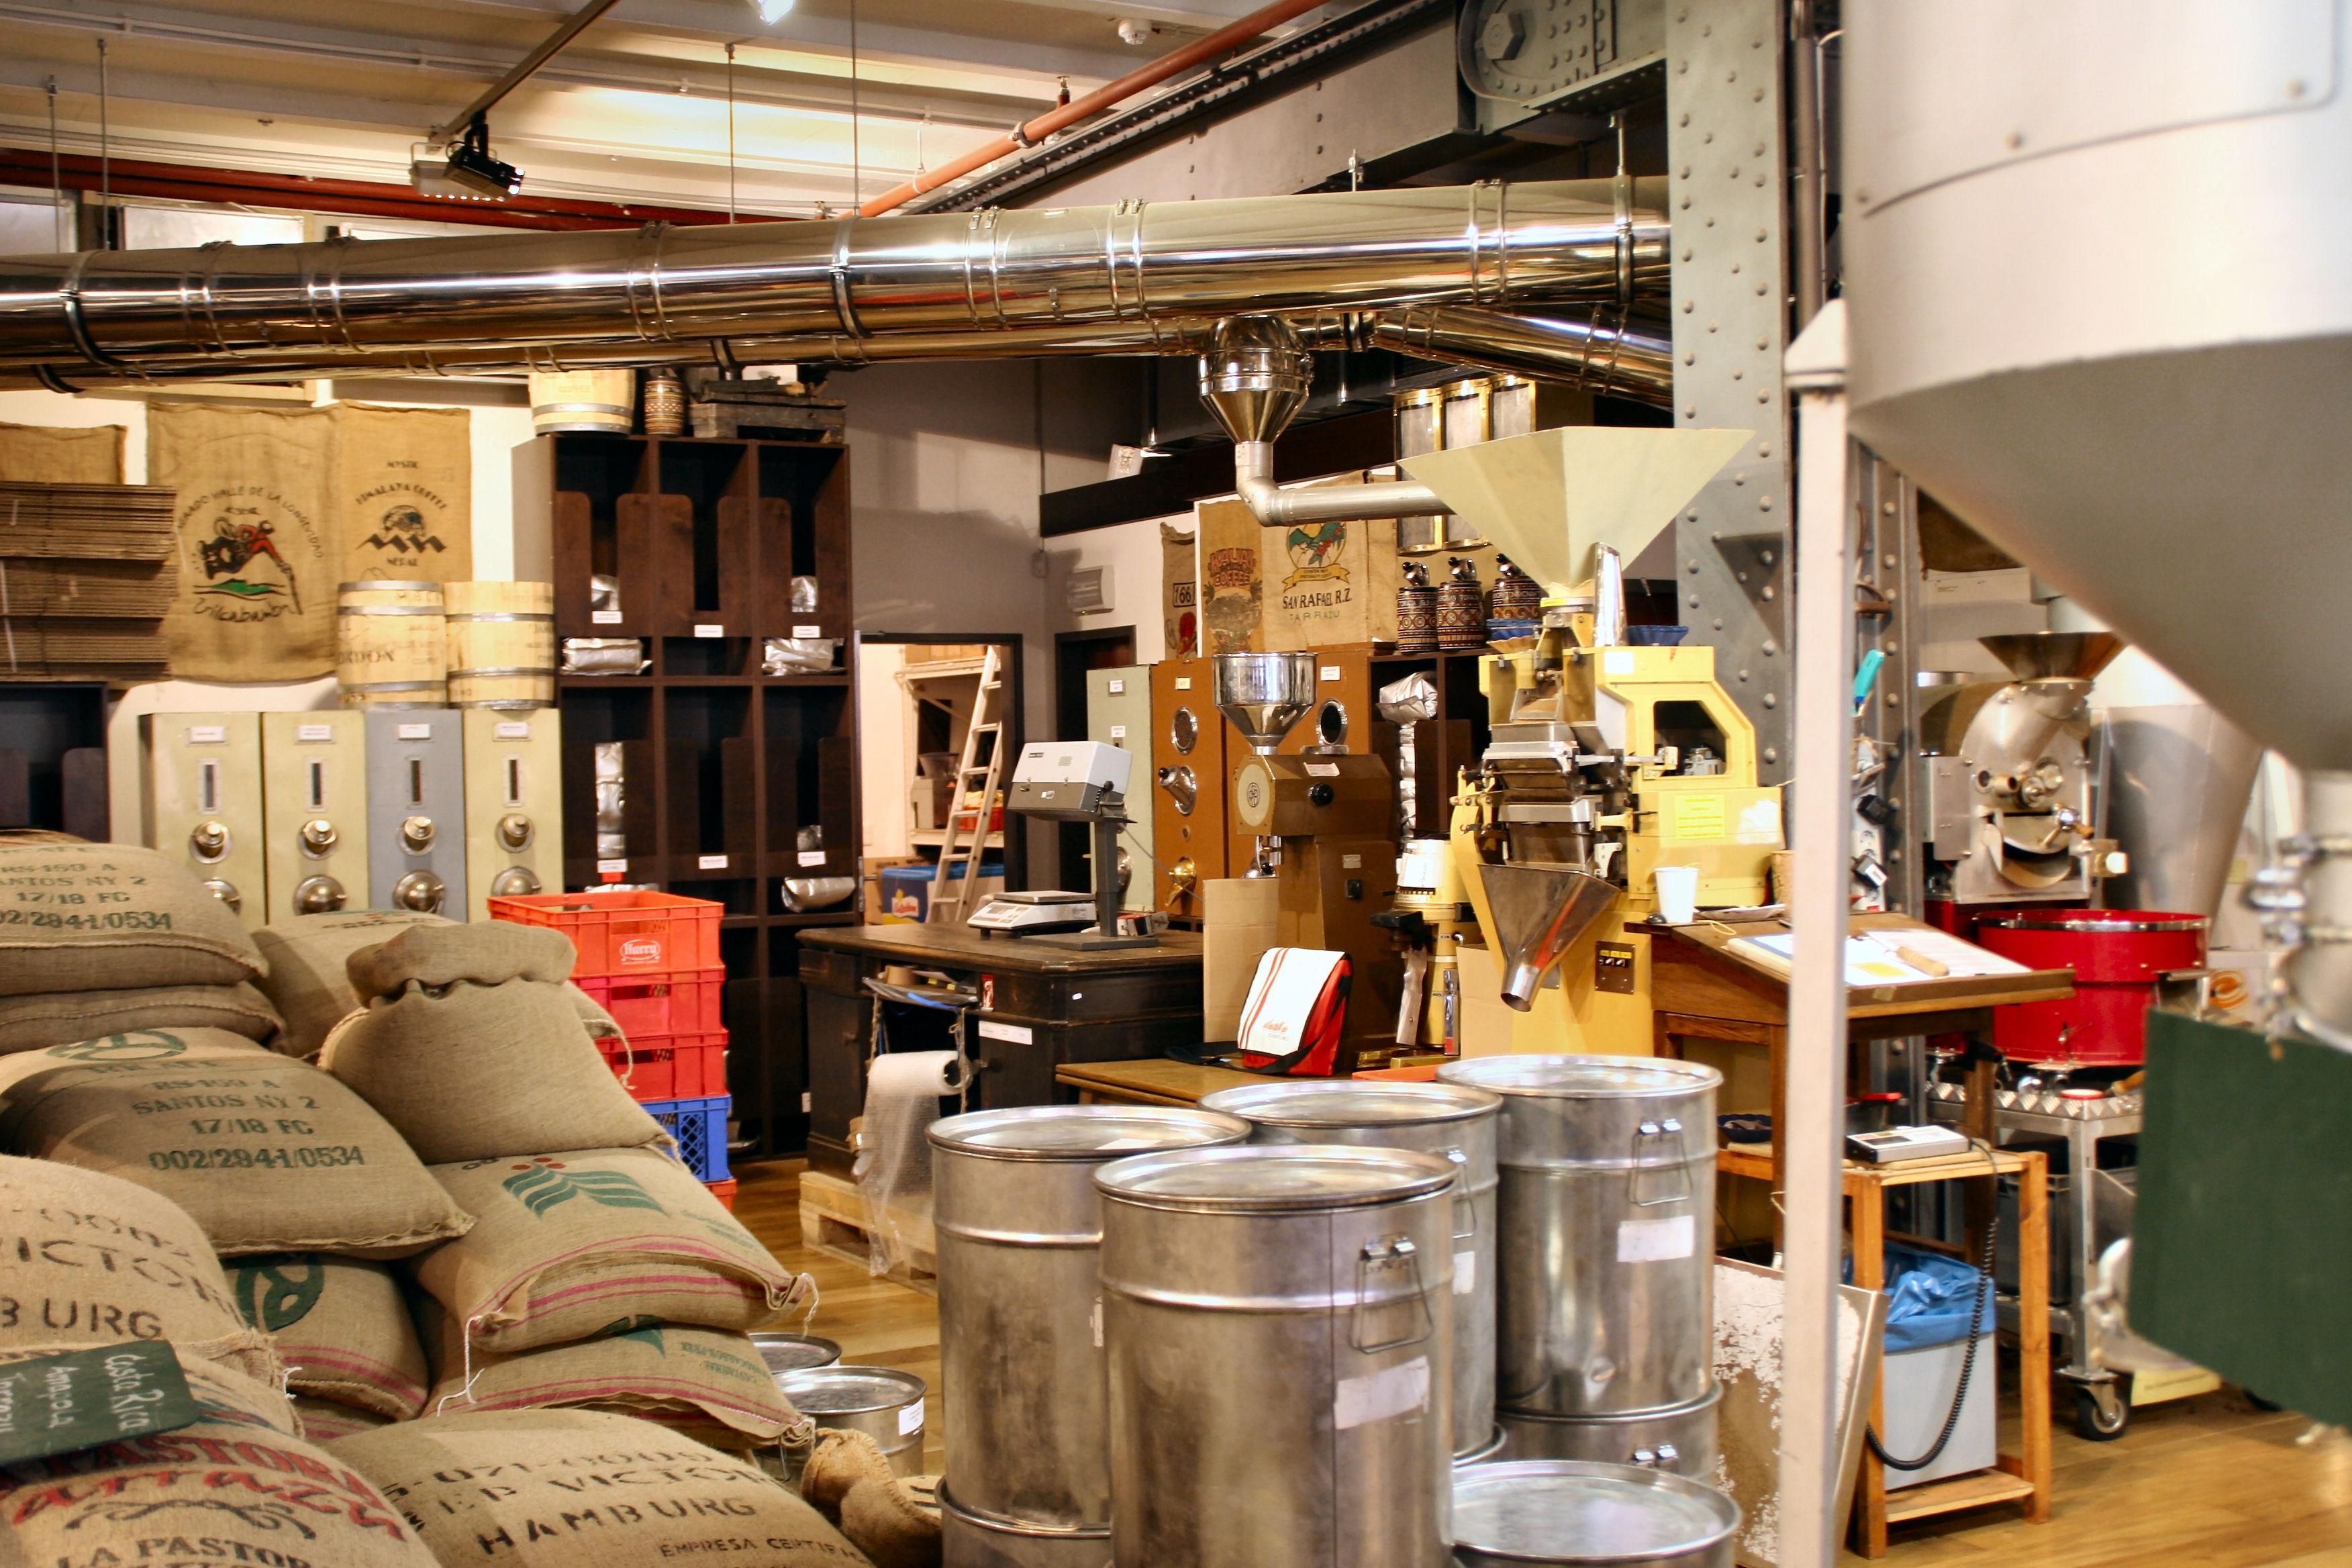 Free Images Room Interior Design Hamburg Manufactory Coffee